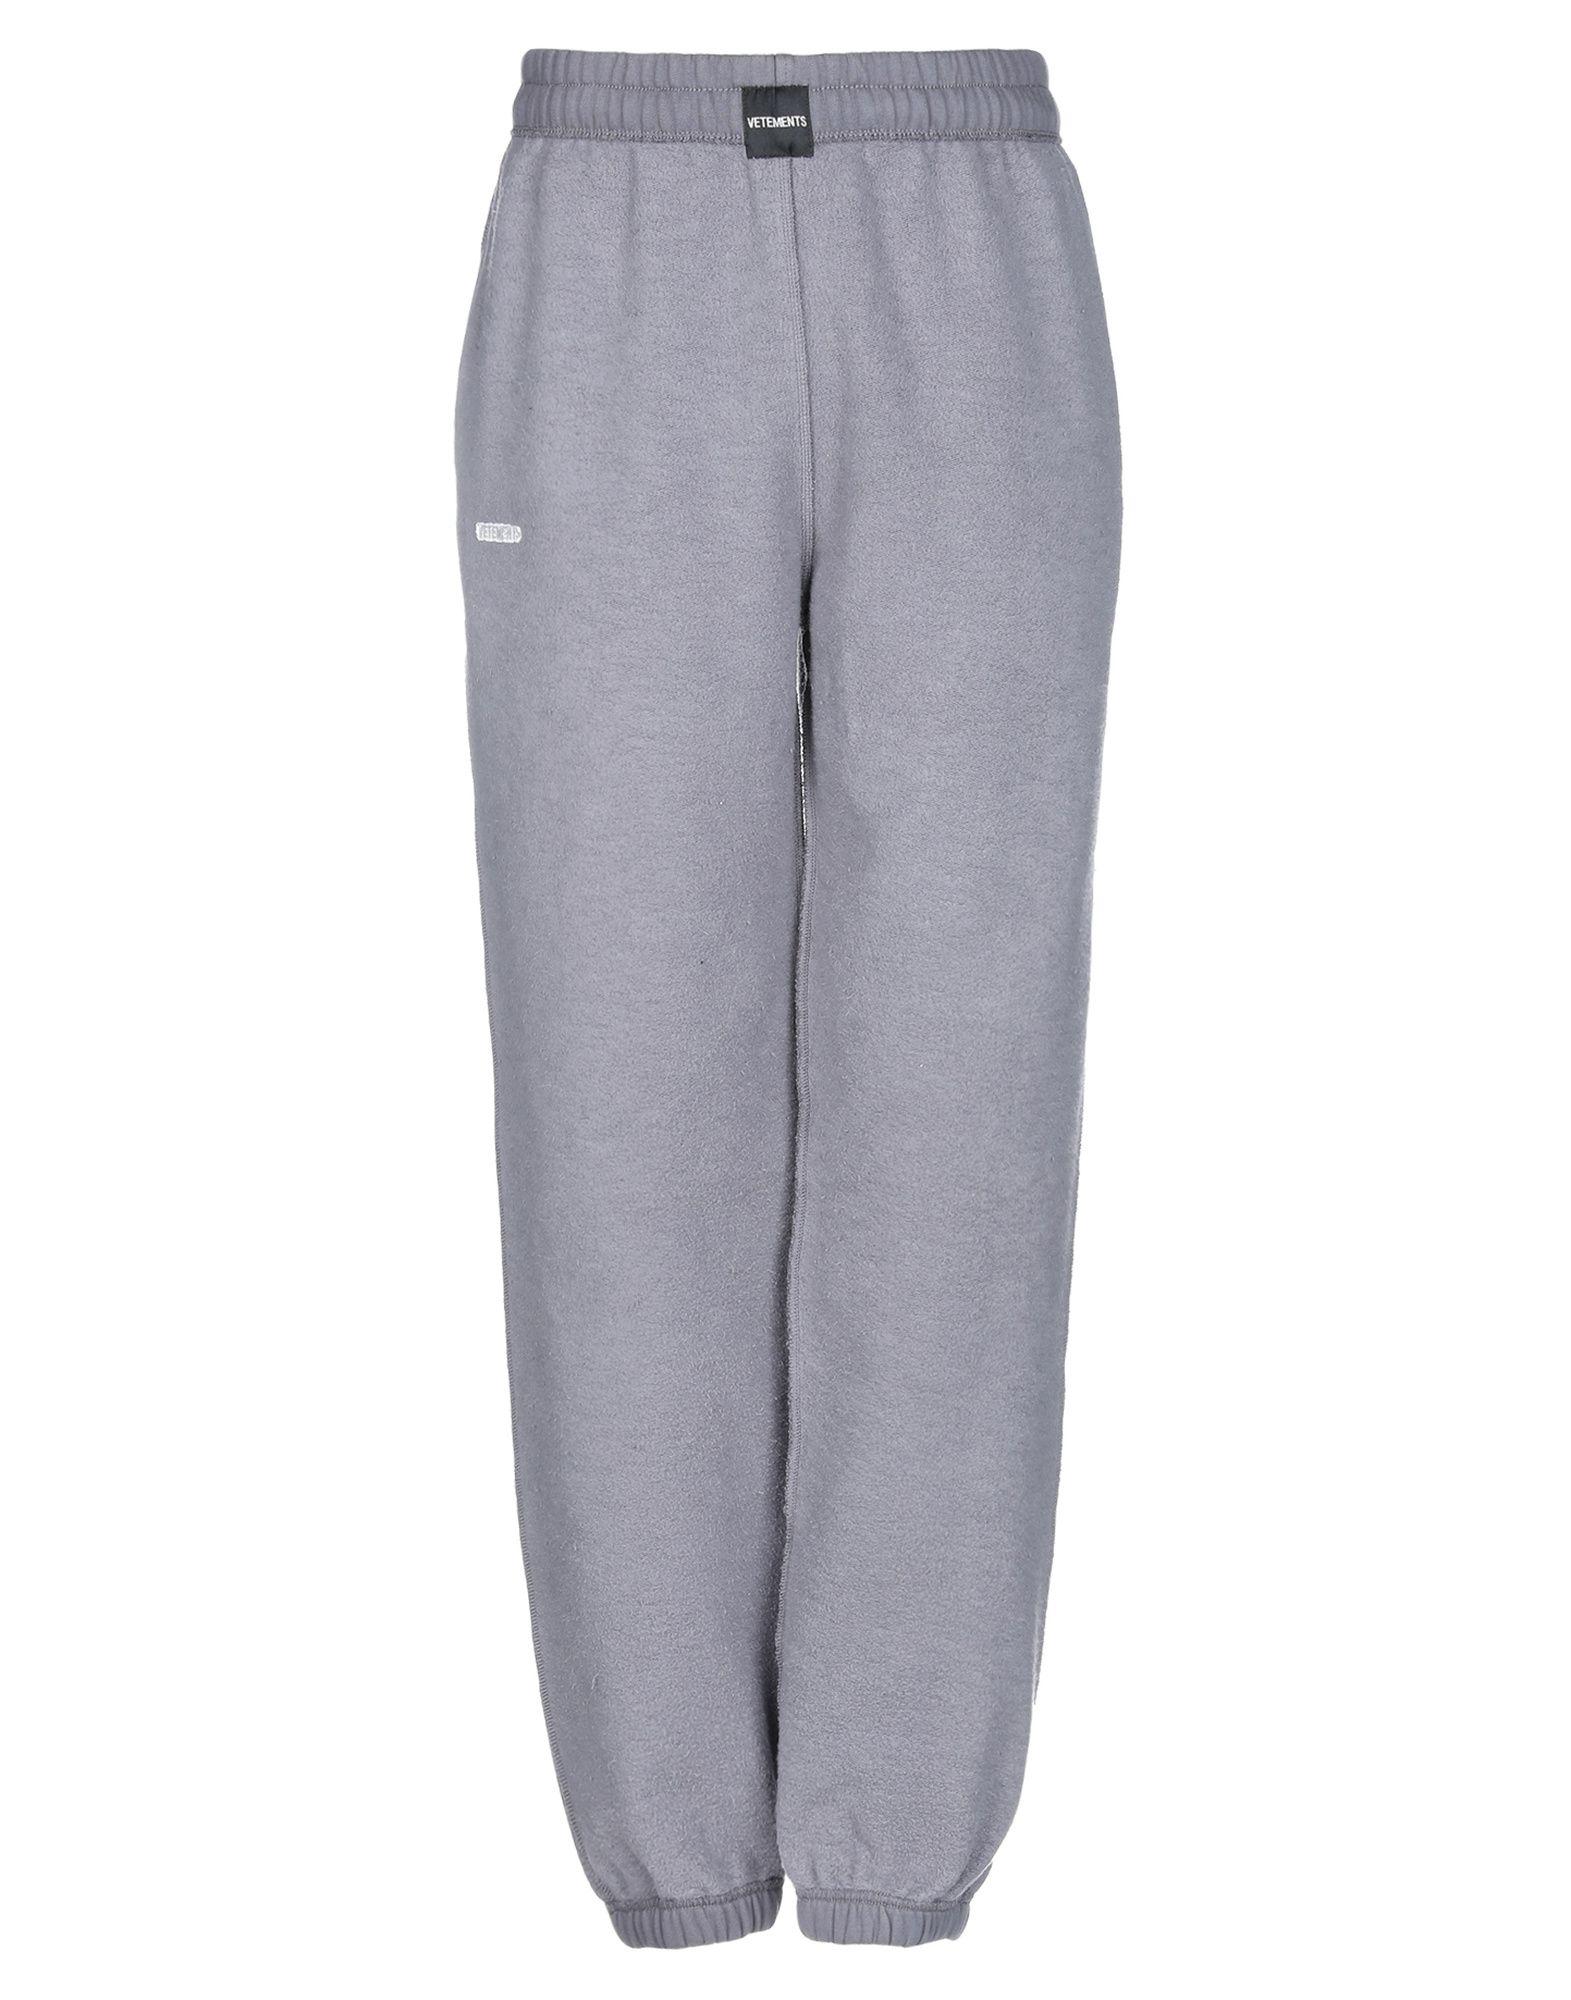 Pantalone Vetements Vetements Vetements uomo - 13324121XO 7b9